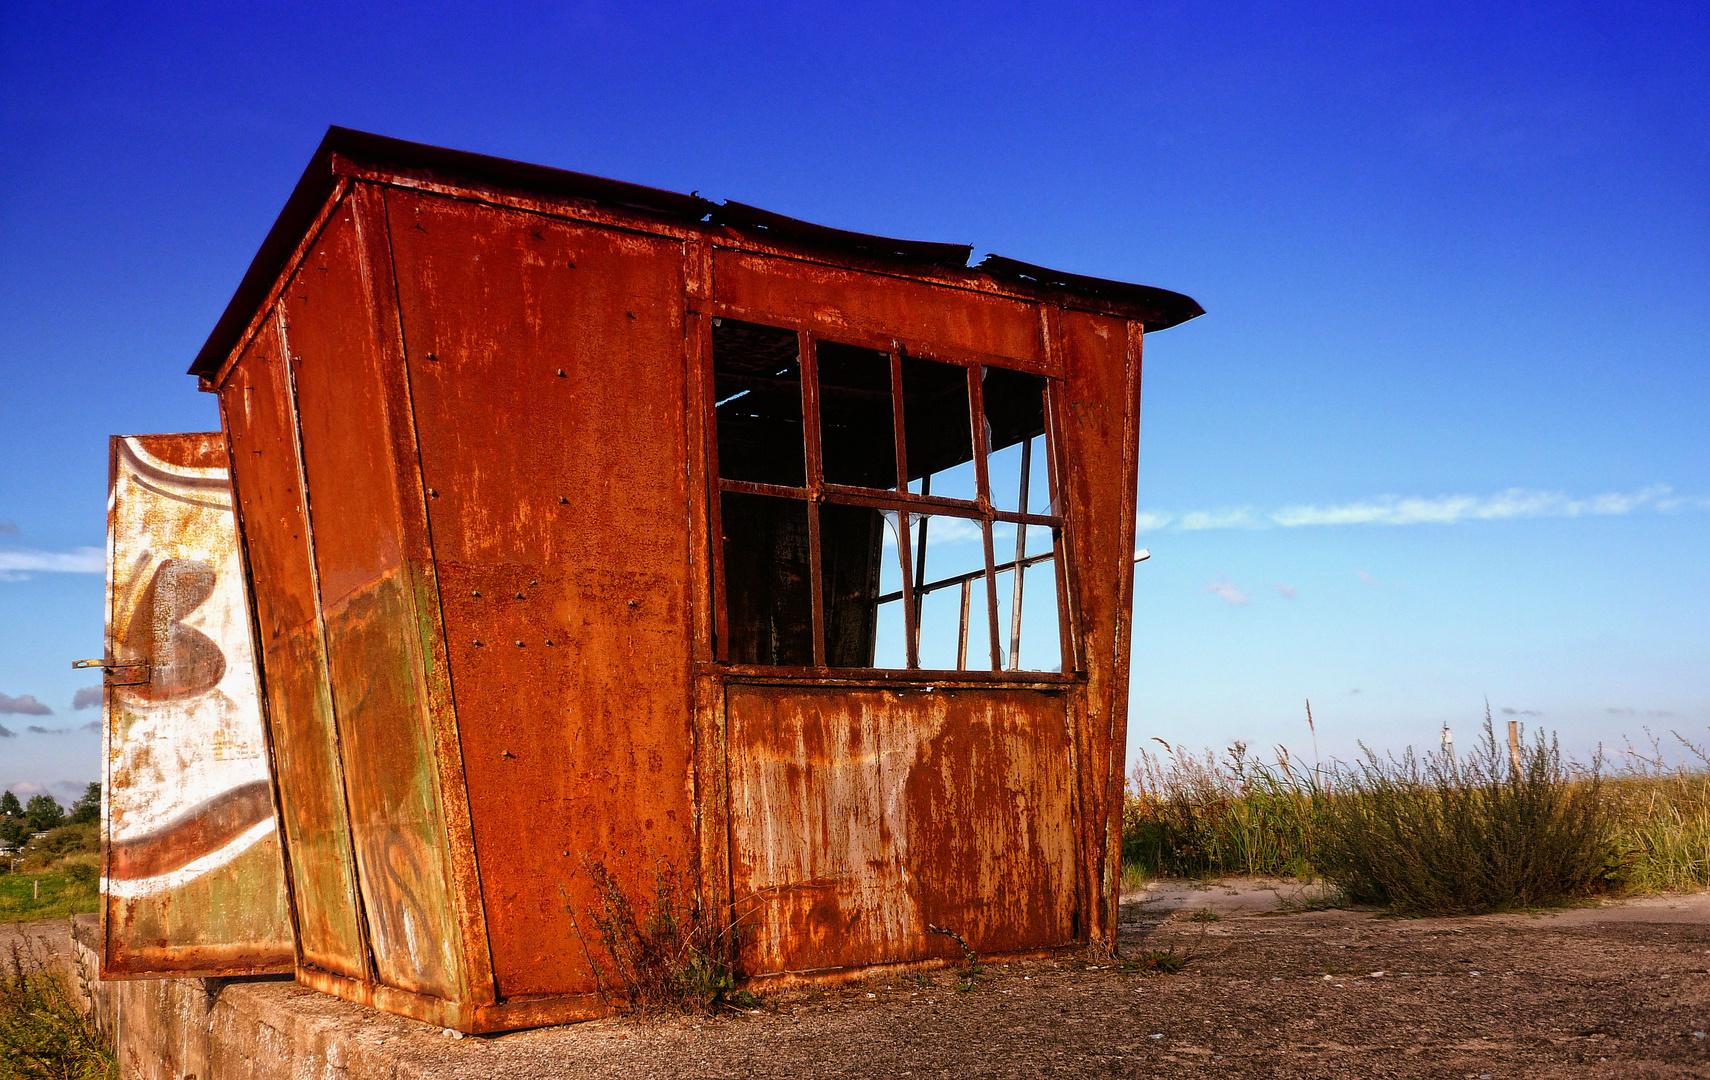 Stahl Hütte am Meer auf Usedom